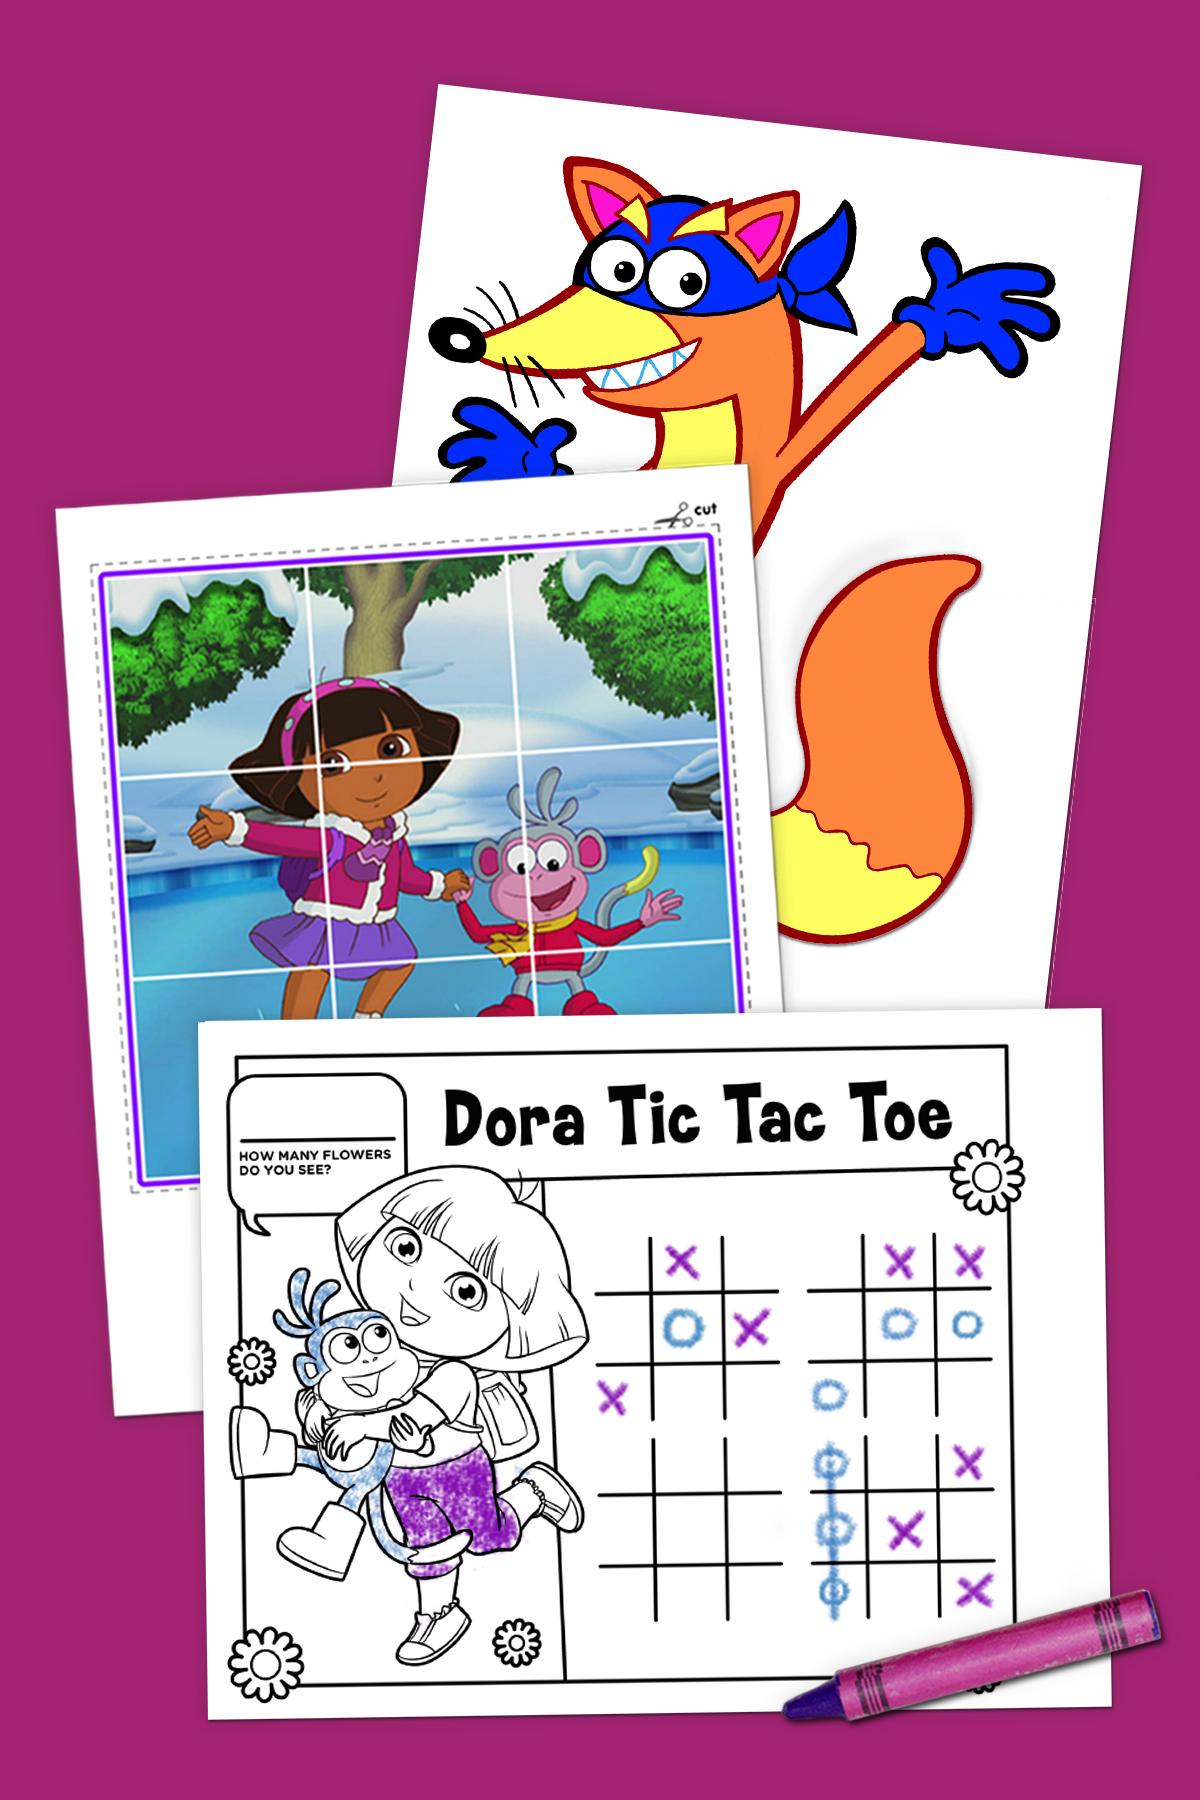 Top 10 Dora The Explorer Printables Of All Time